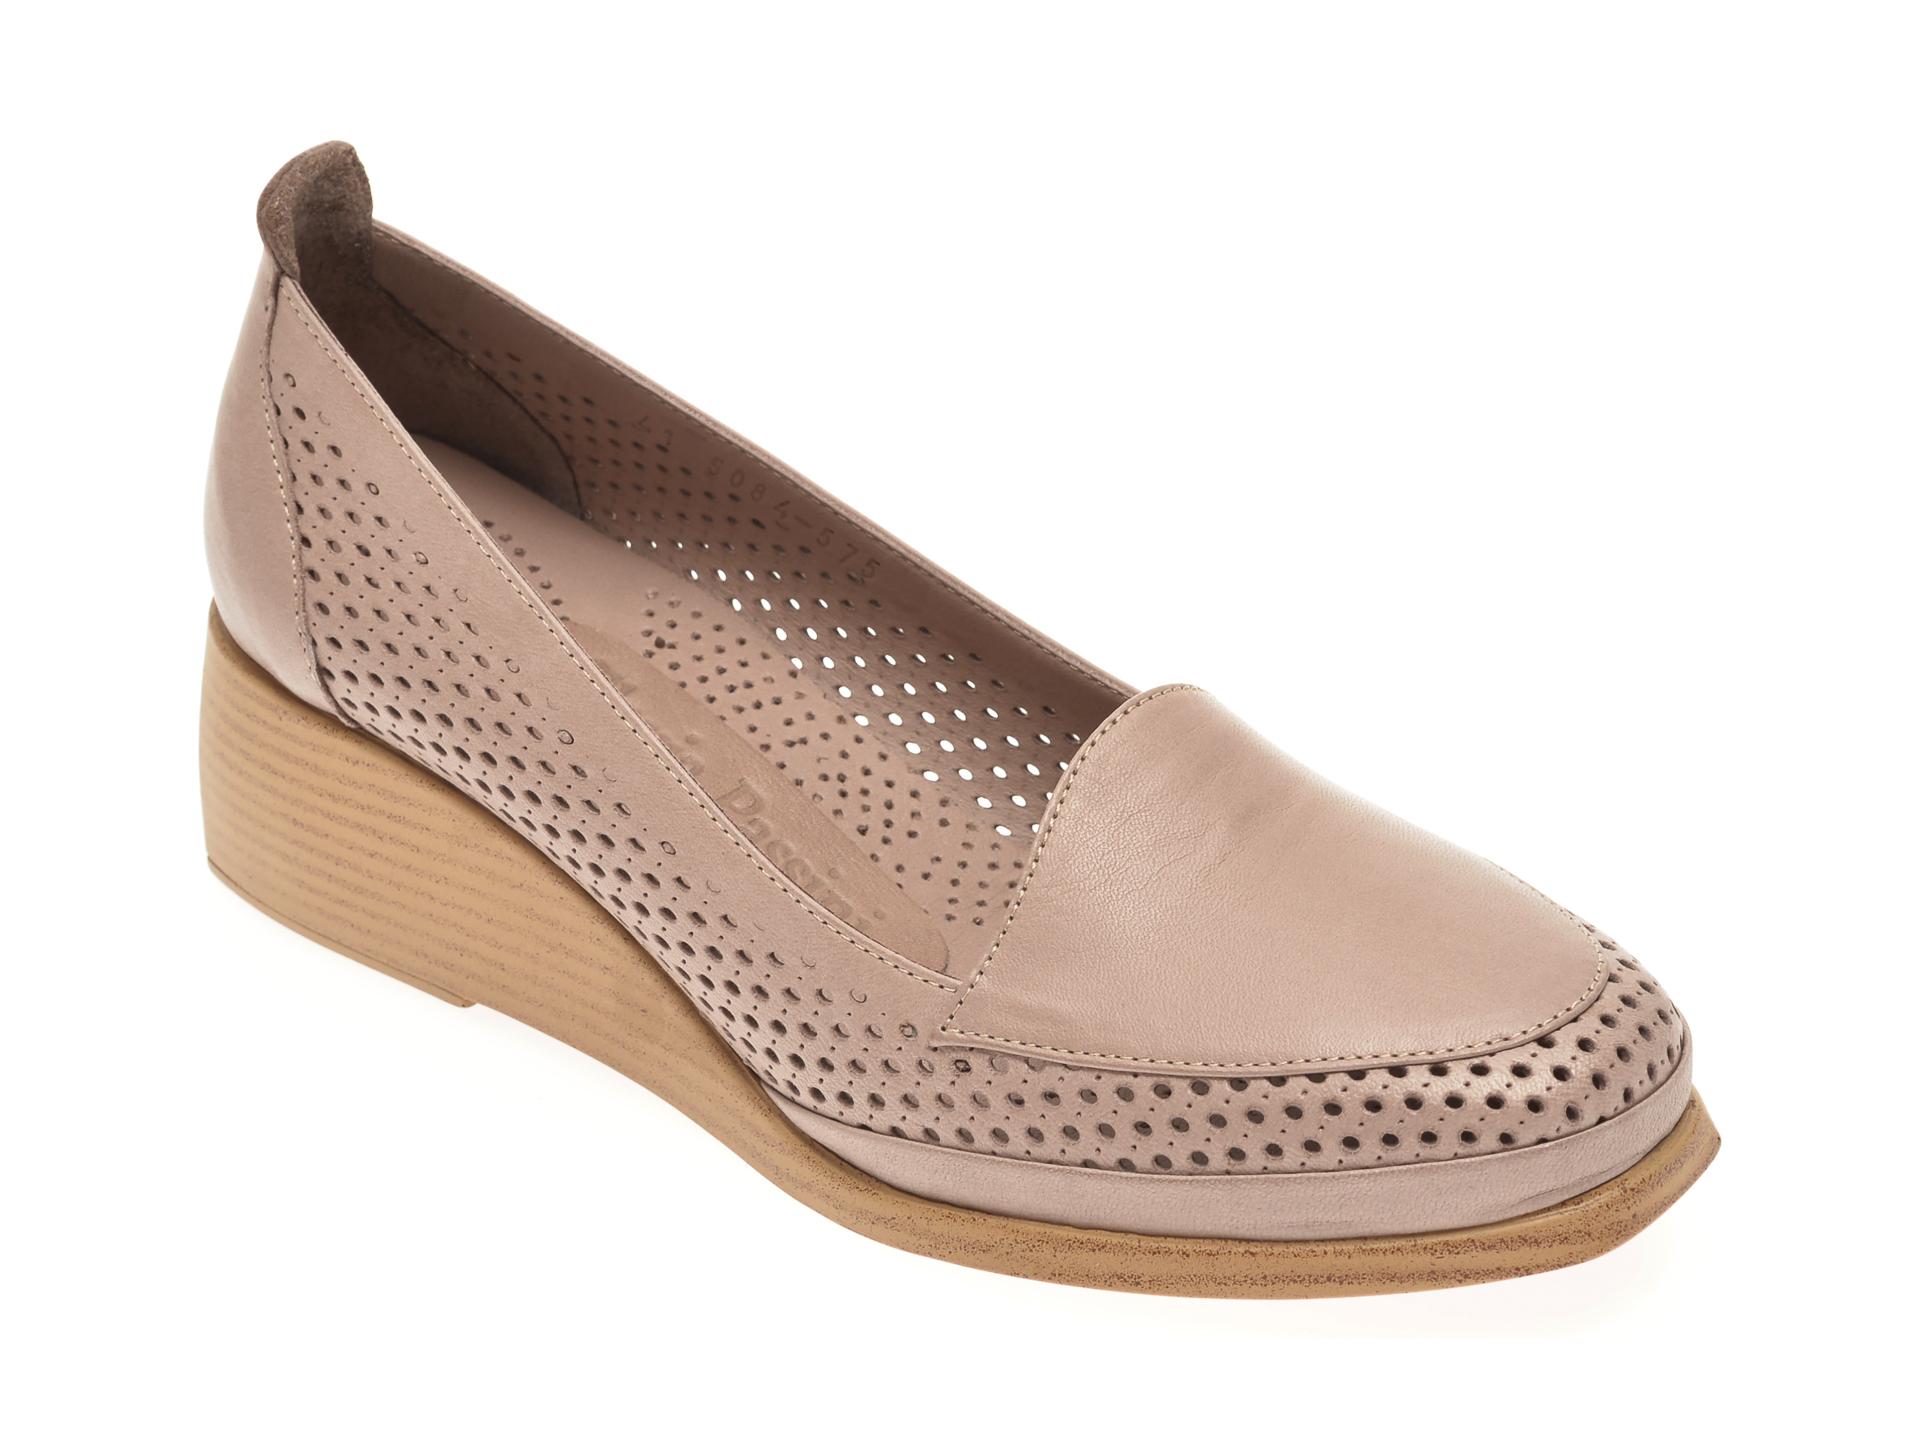 Pantofi FLAVIA PASSINI gri, 0105084, din piele naturala